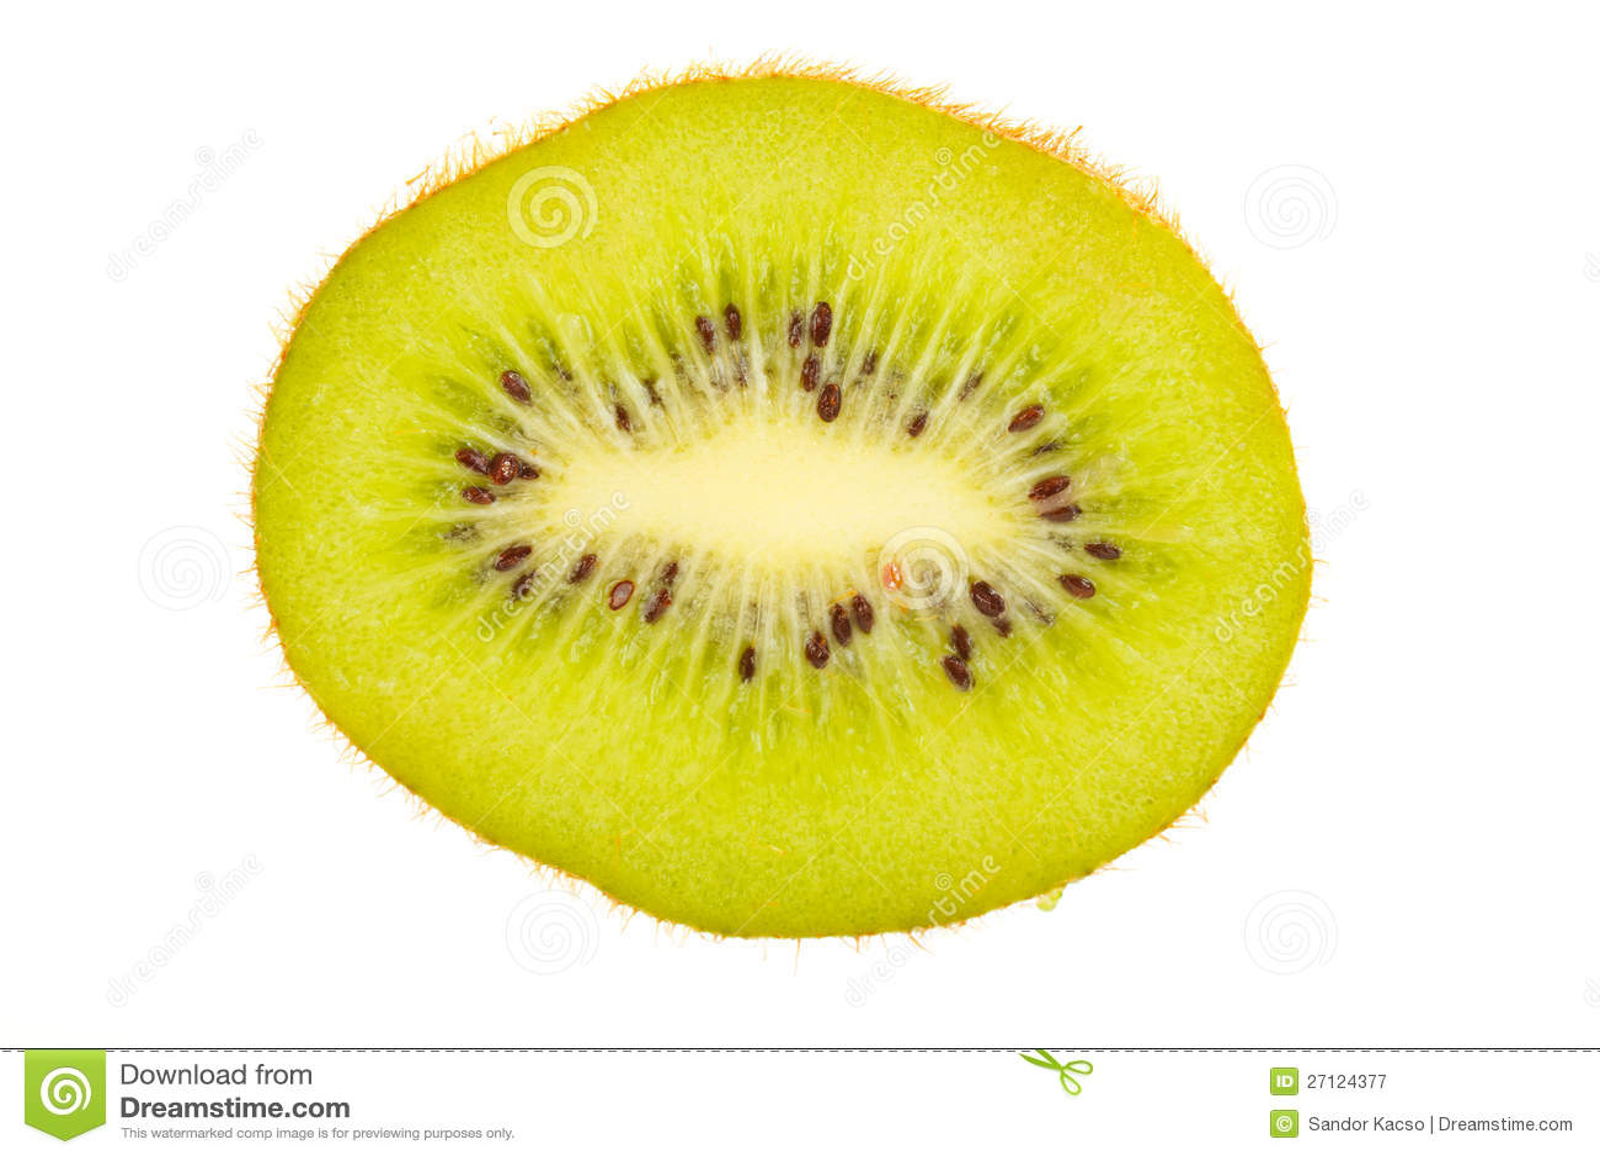 Kiwi fruit cut in half close up - Half Cut Kiwi Royalty Free Stock Photography Image 27124377